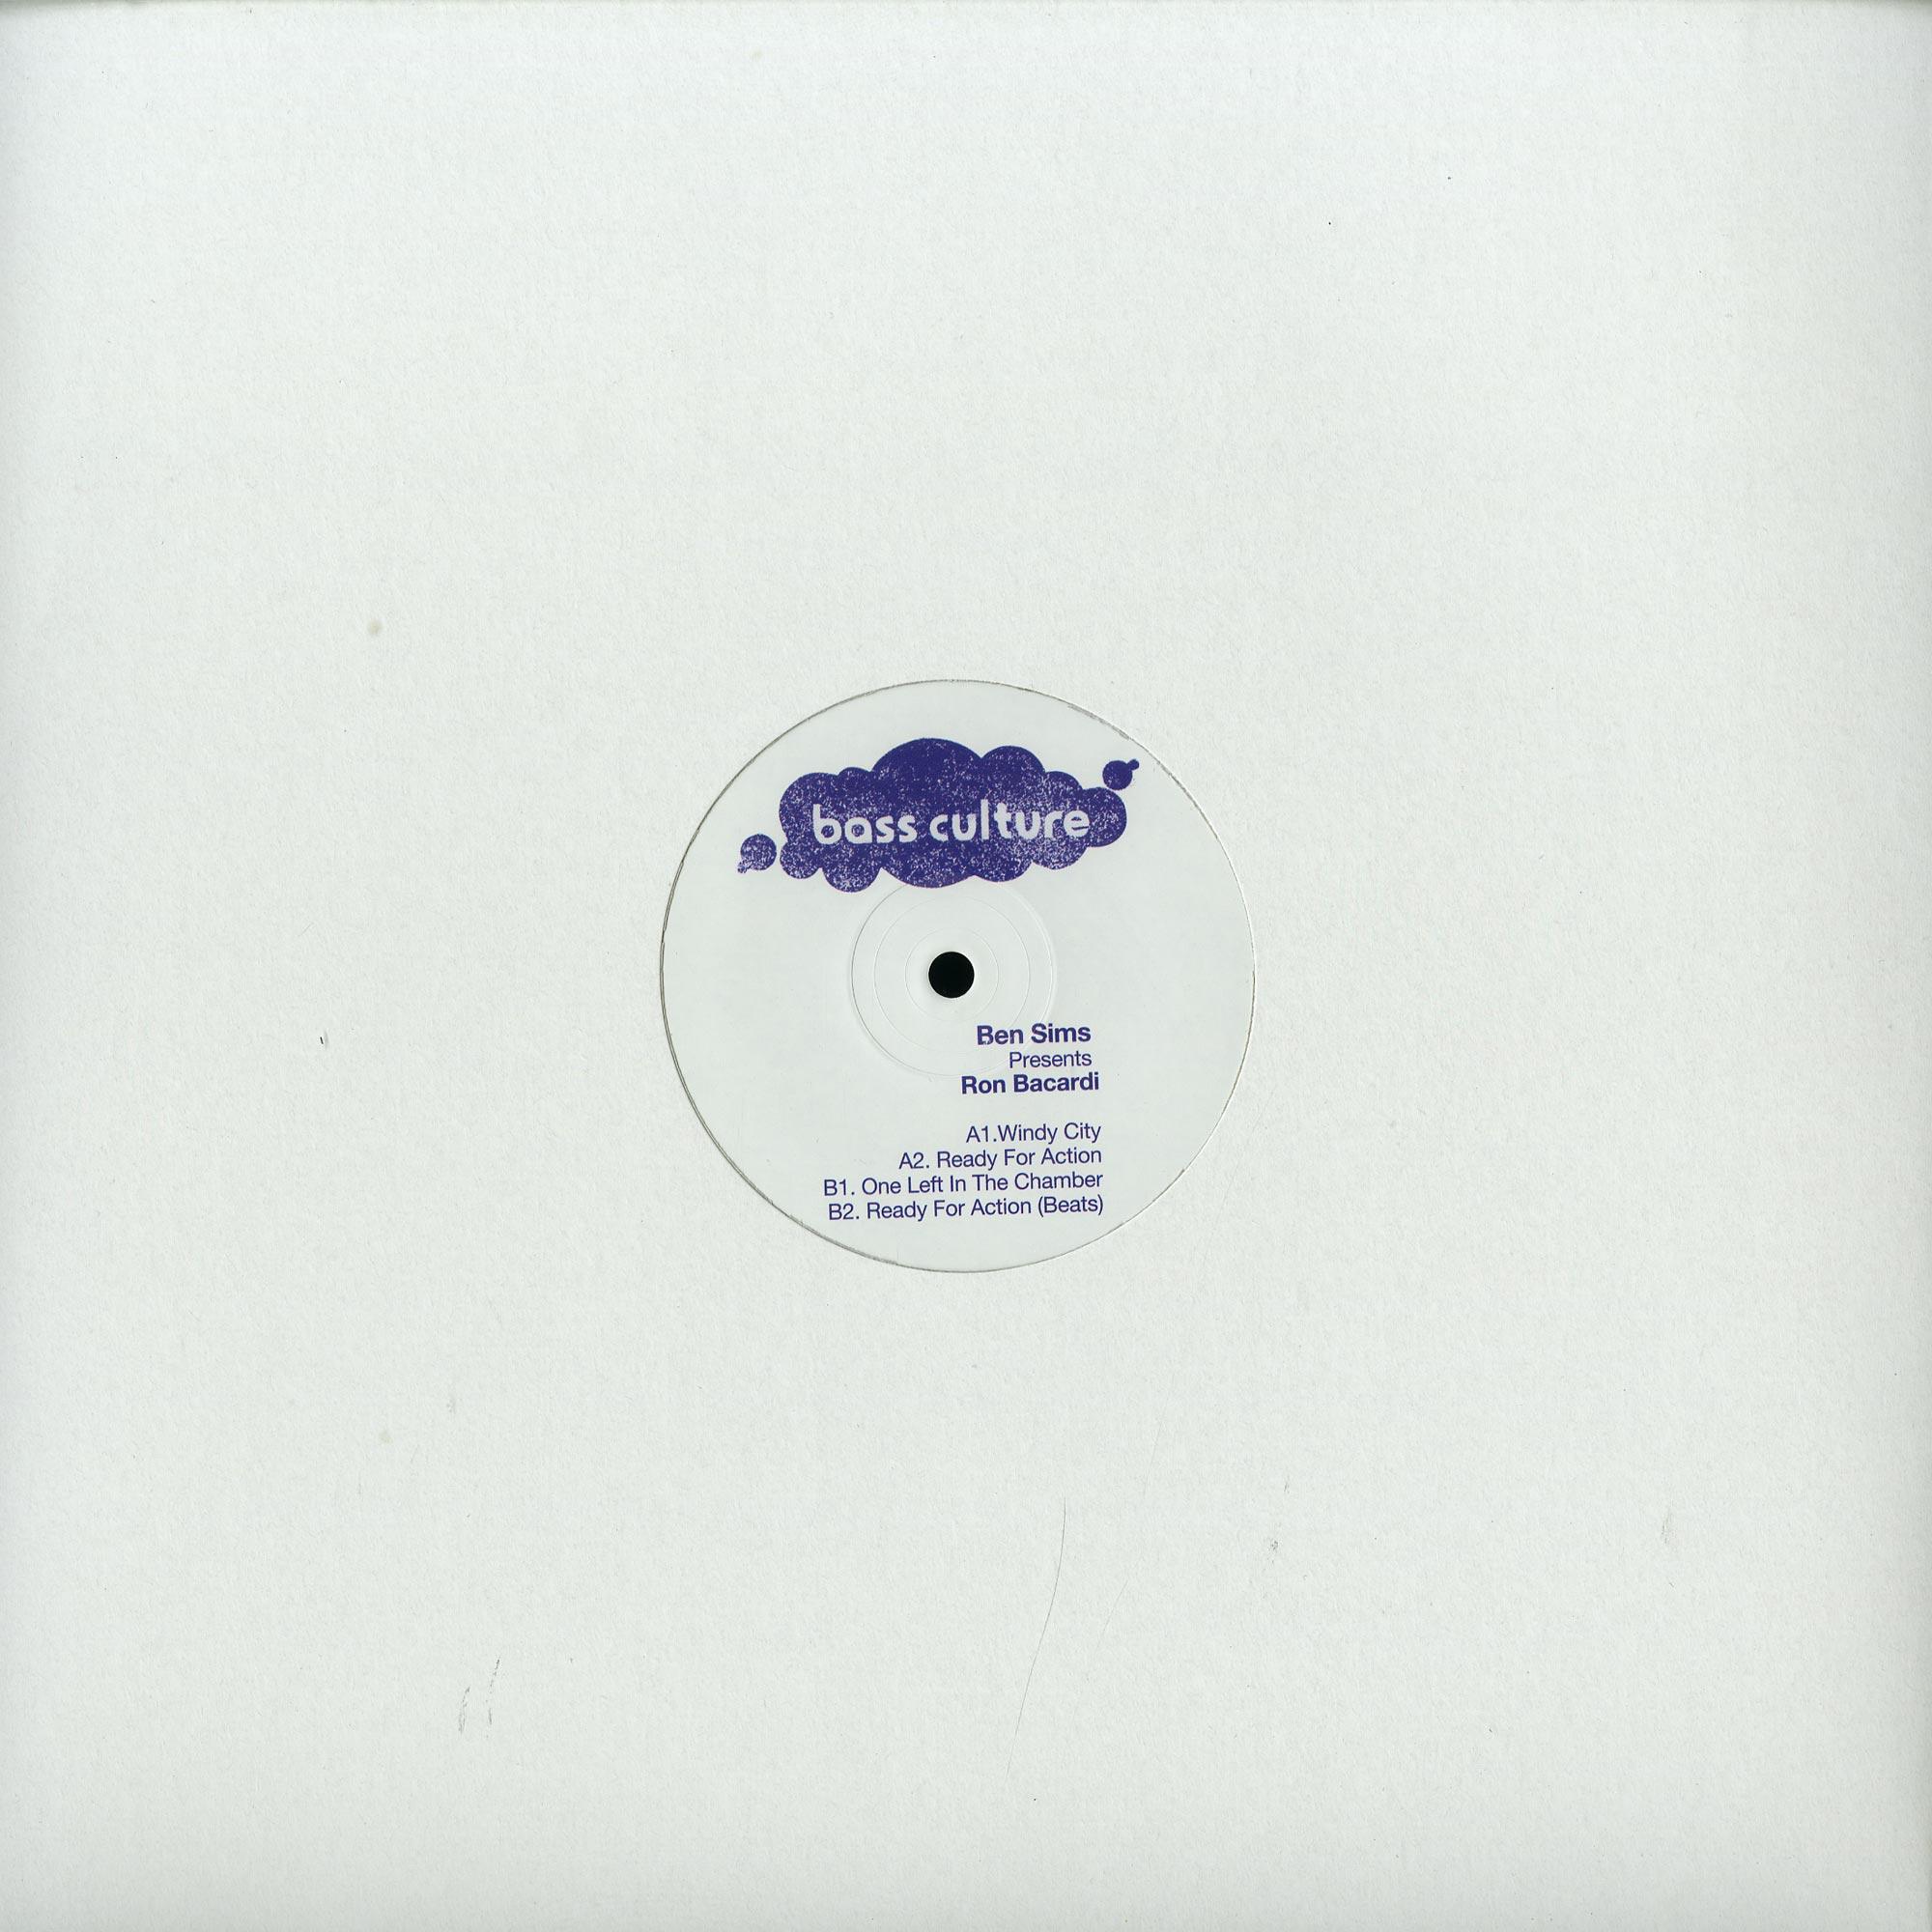 Ben Sims pts Ron Bacardii - EP